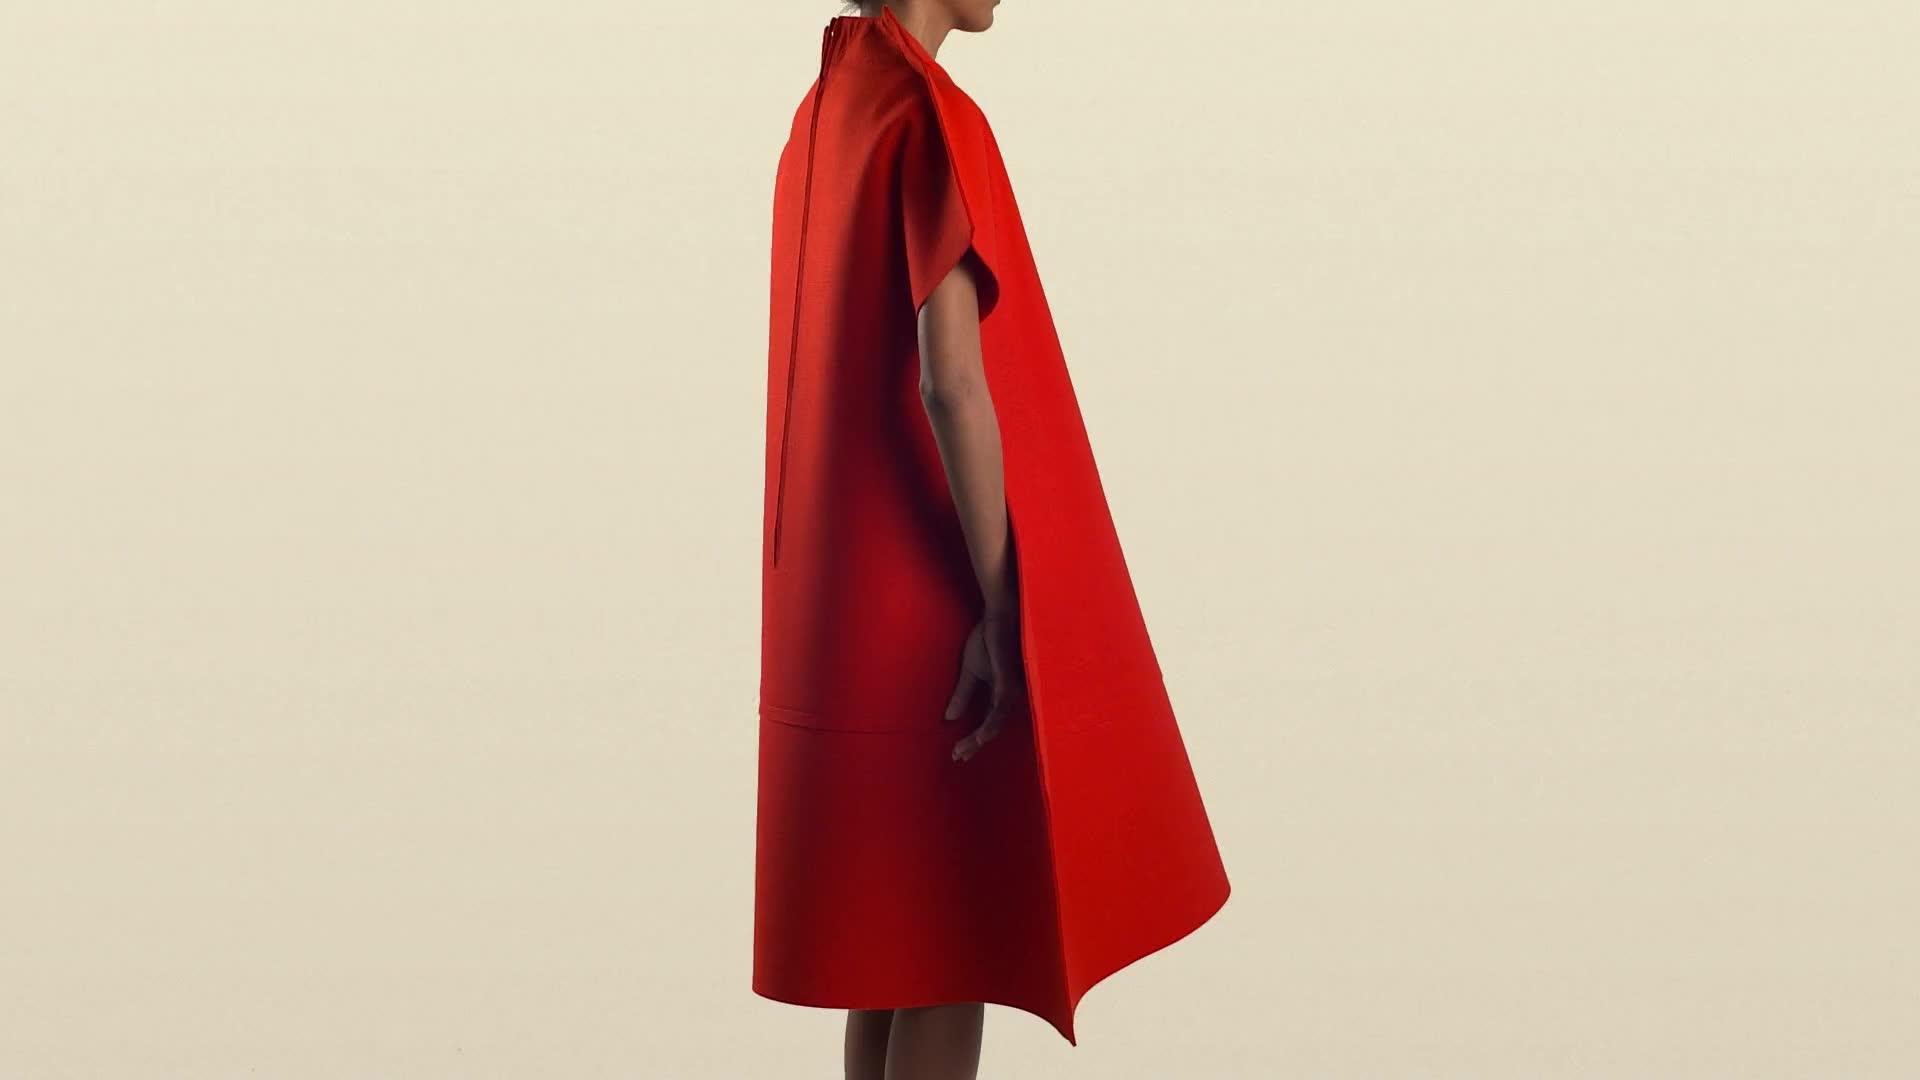 Wallpaper fashion design awards design video film woman